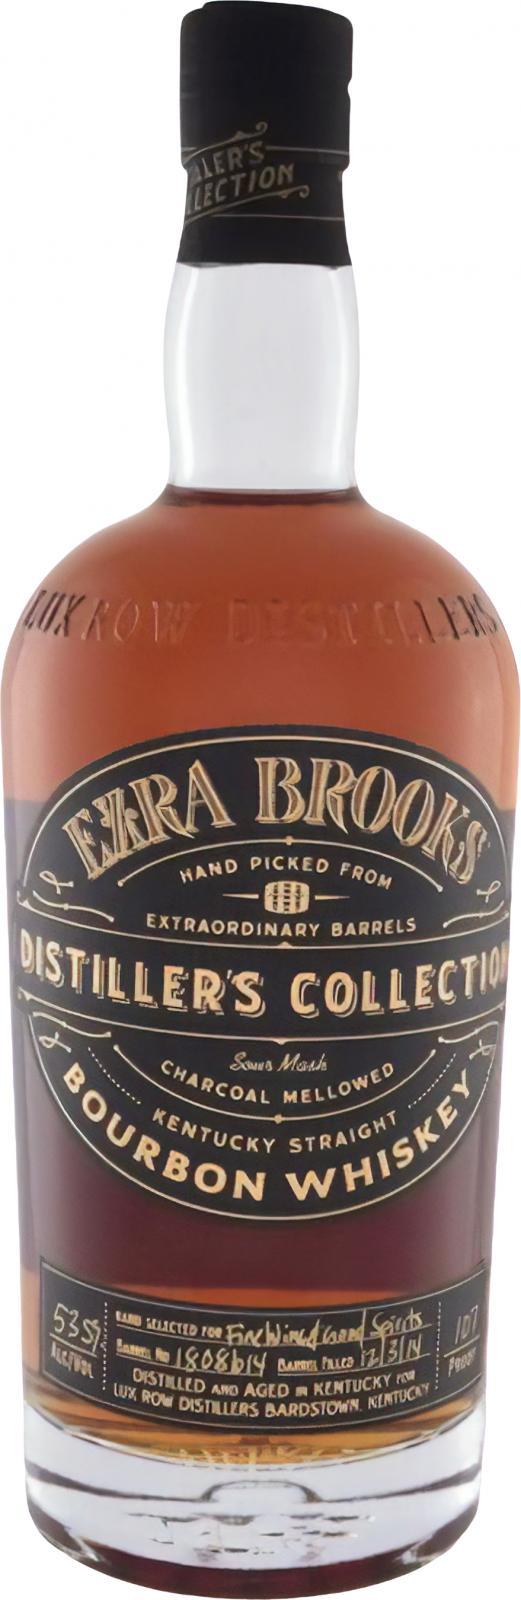 Ezra Brooks Distiller's collection